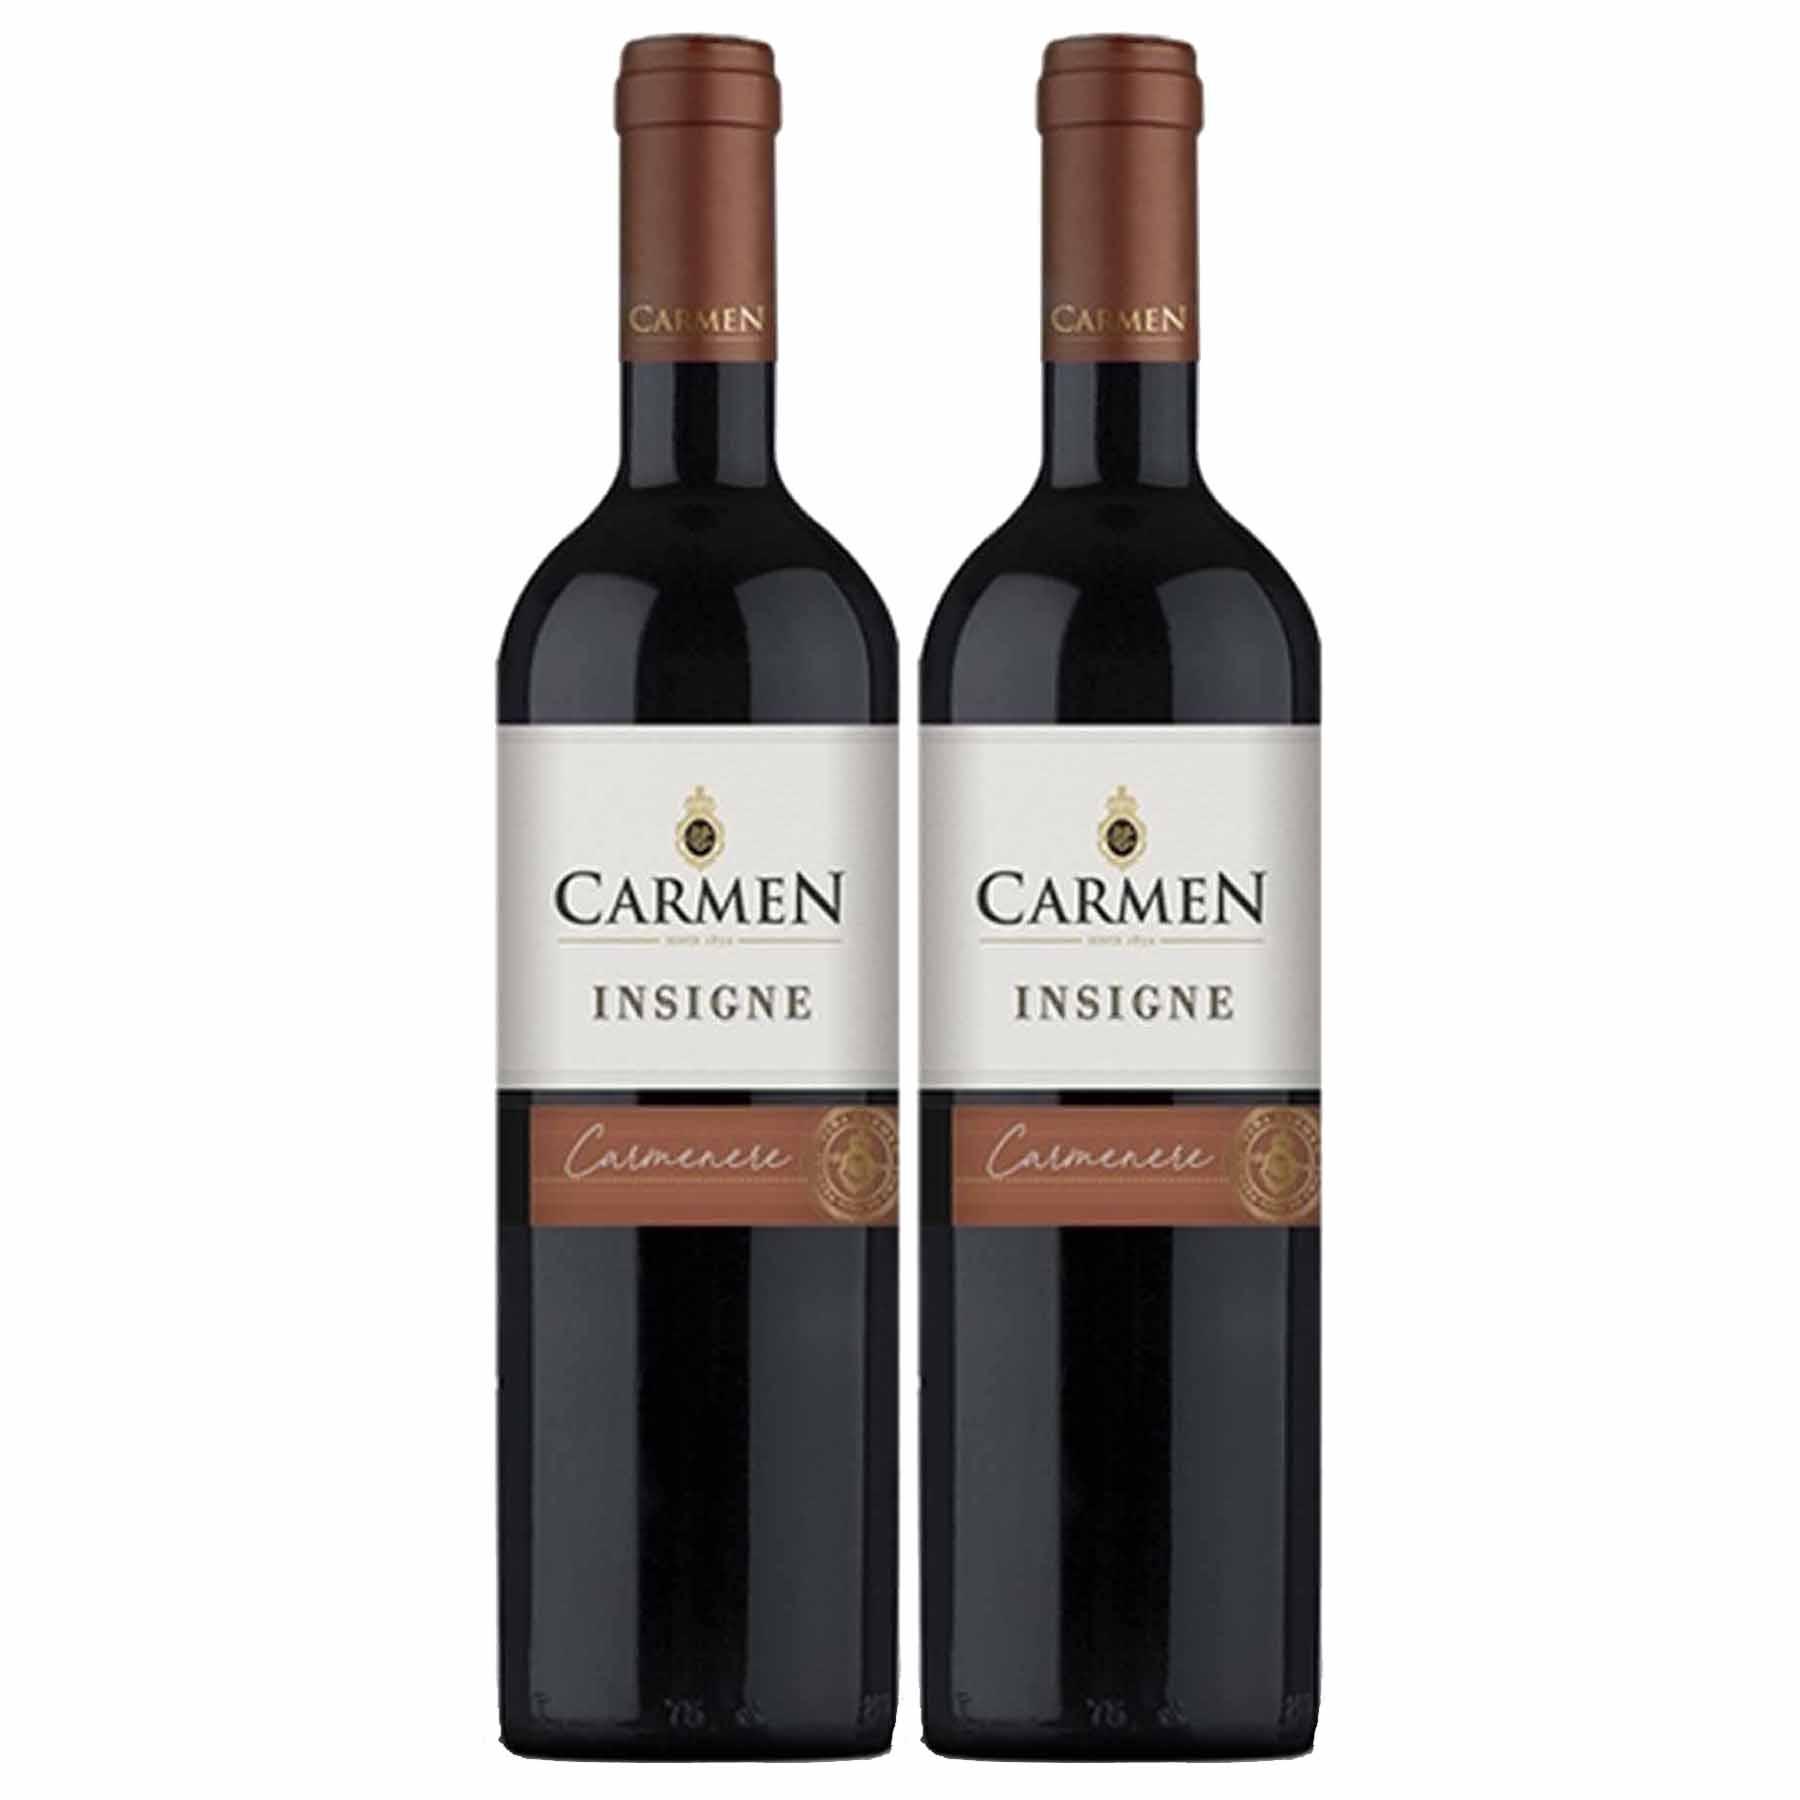 Kit 2x Vinho Tinto Chileno Carmen Insigne Carmenere 2018